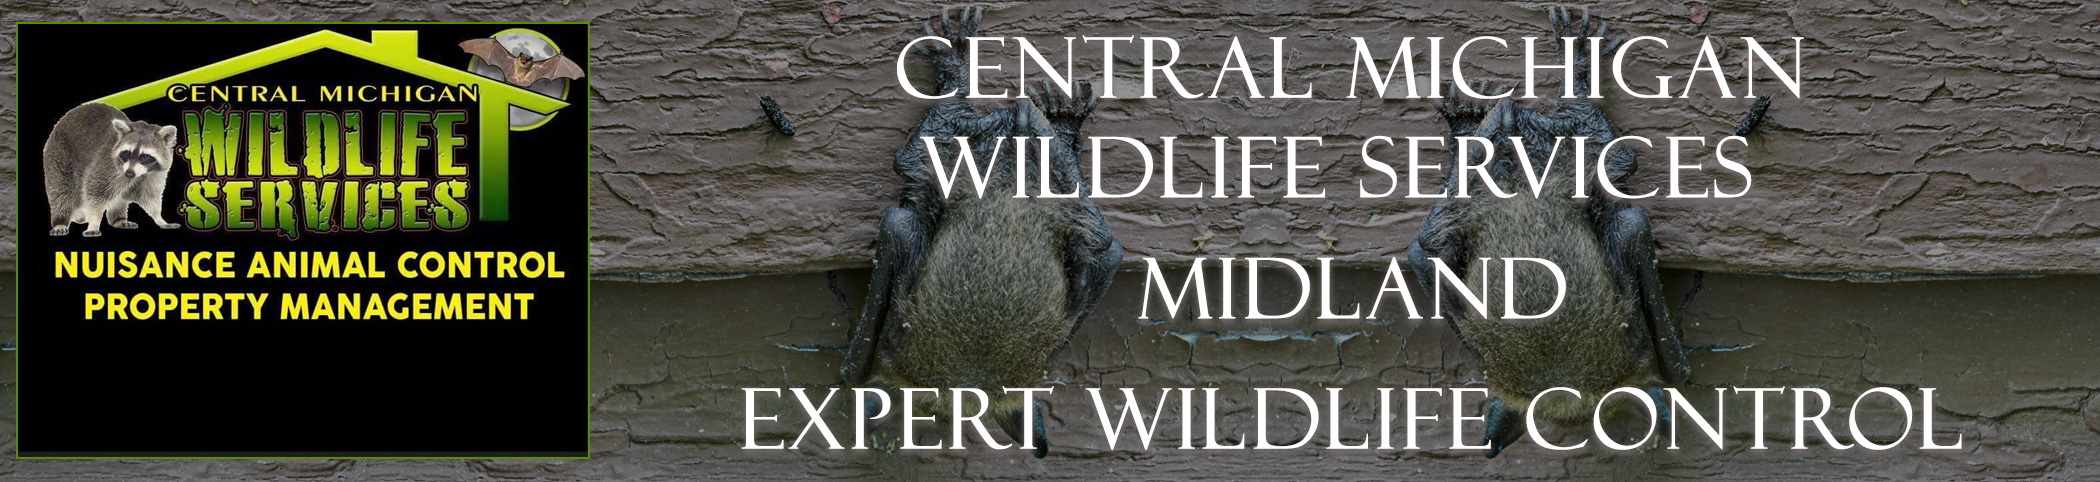 central_michigan_midland_headers